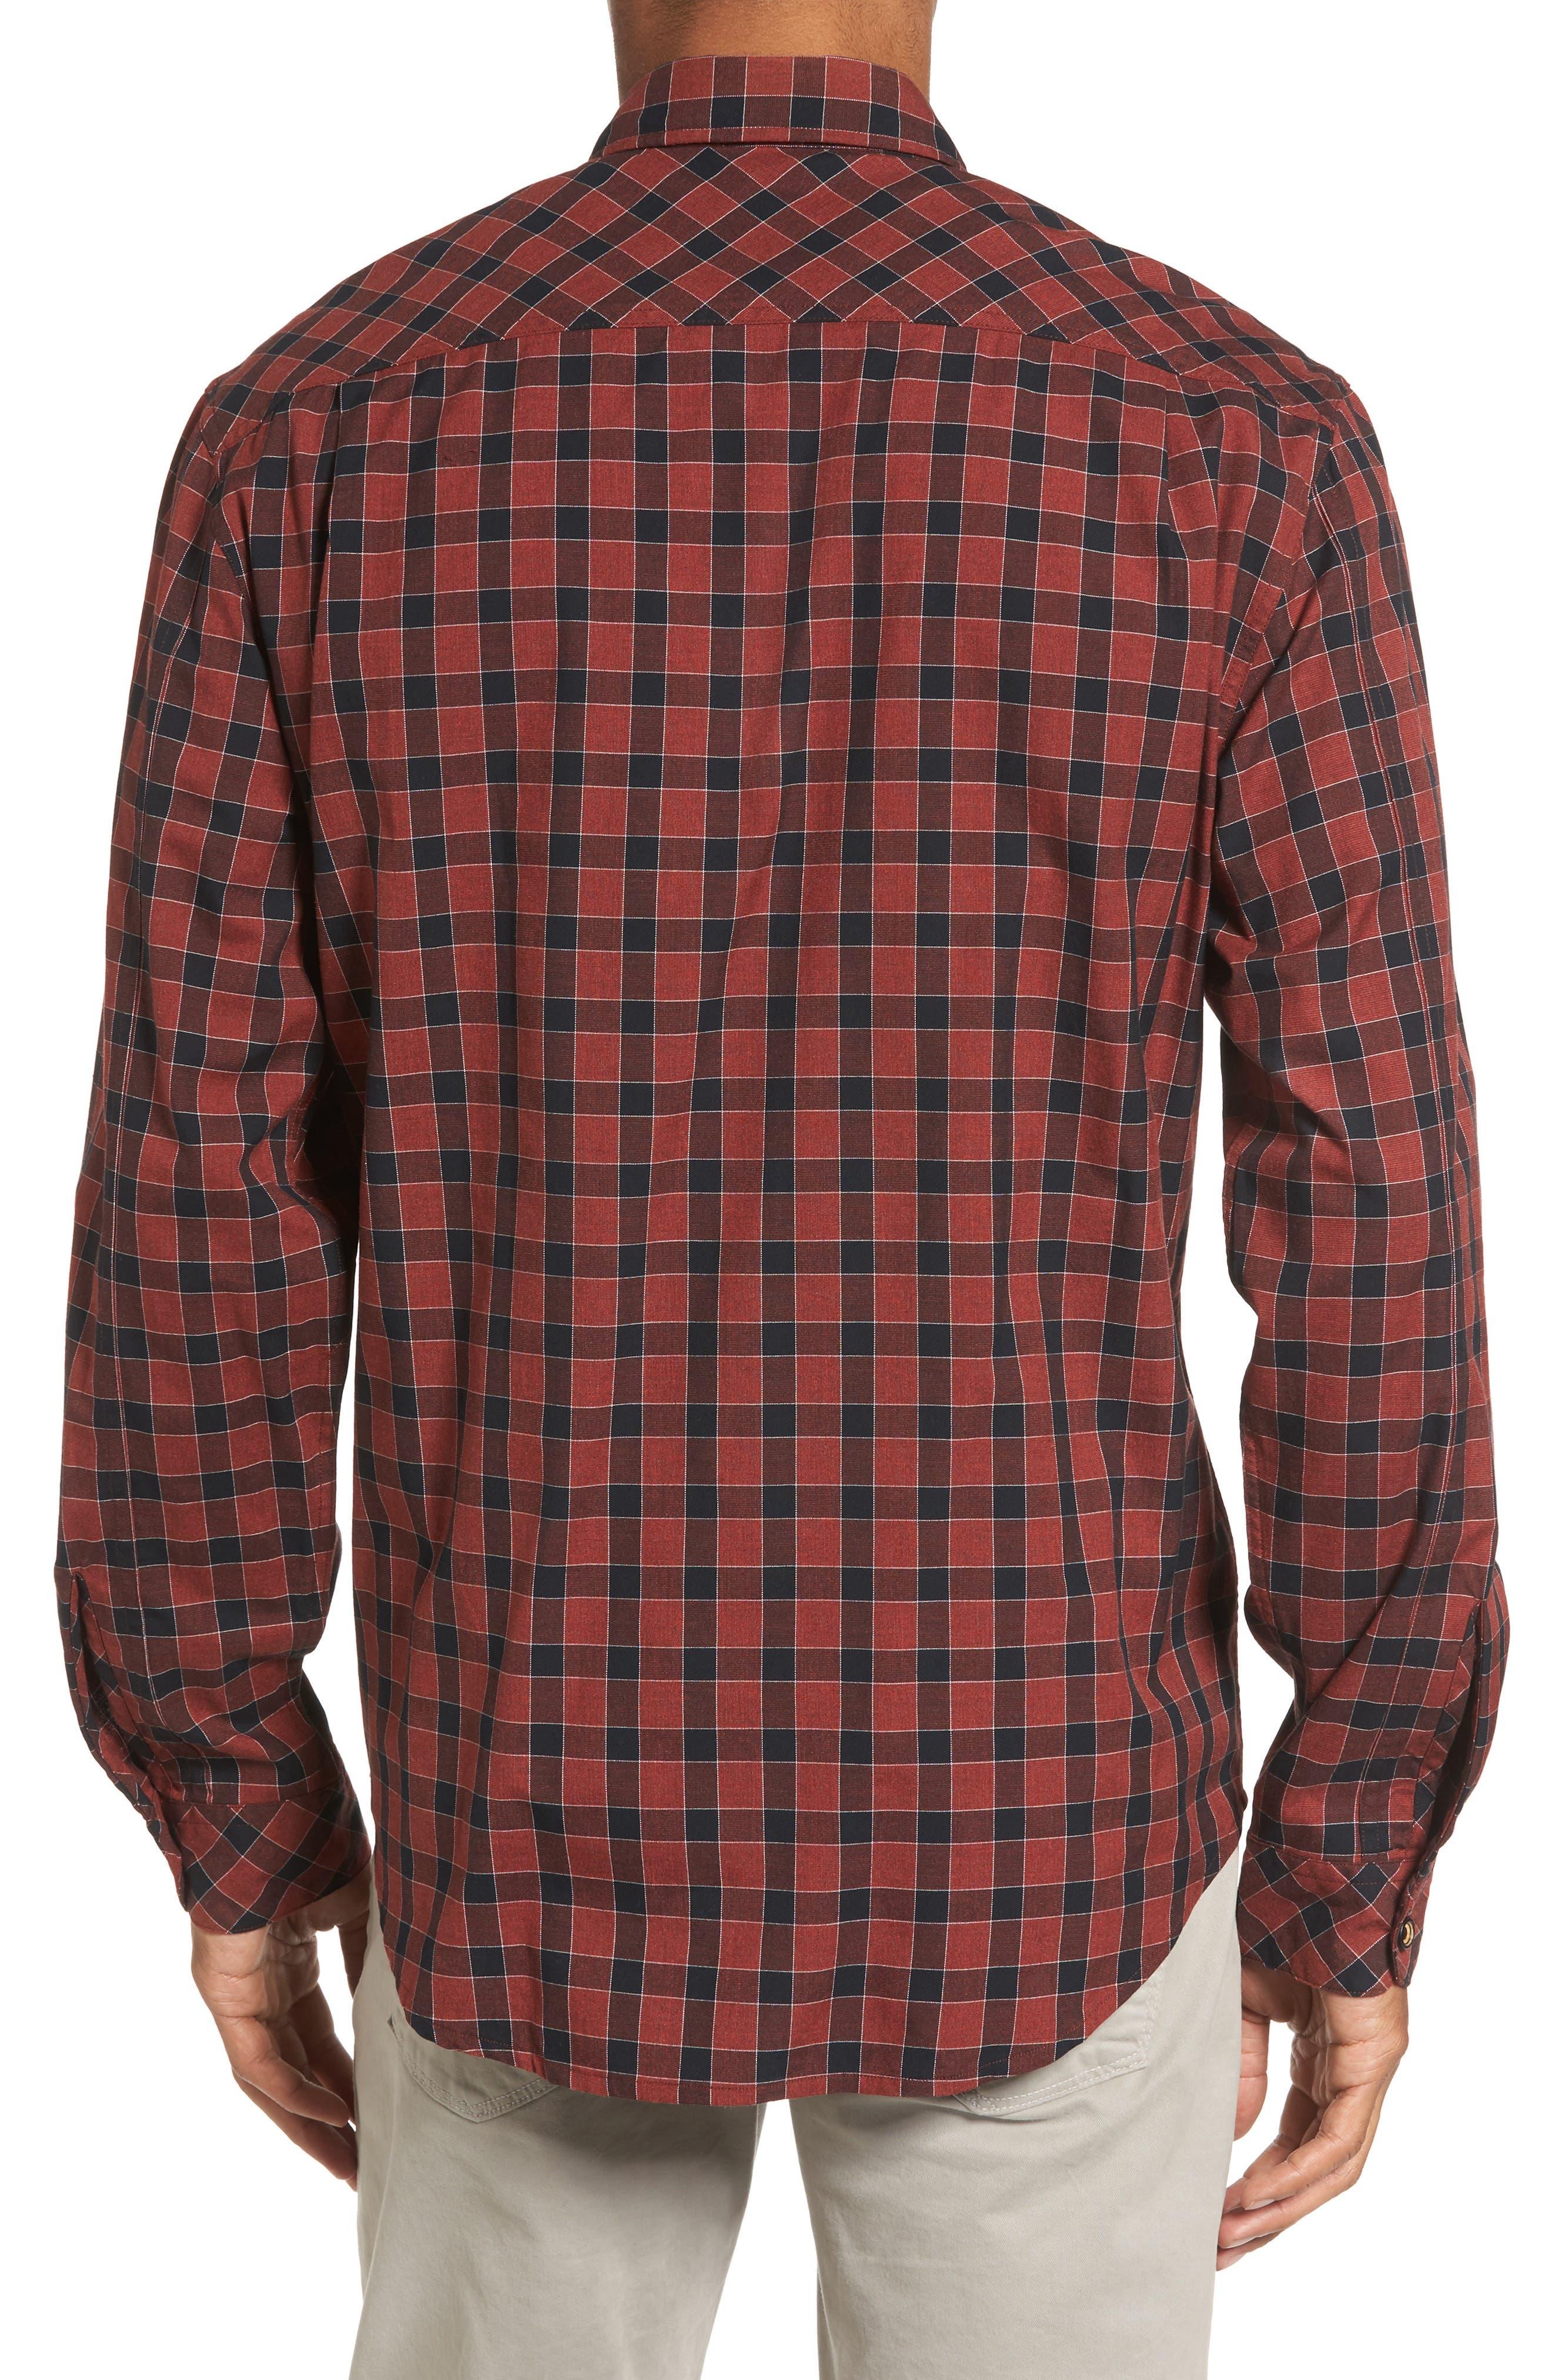 Lake Plaid Flannel Shirt,                             Alternate thumbnail 2, color,                             600